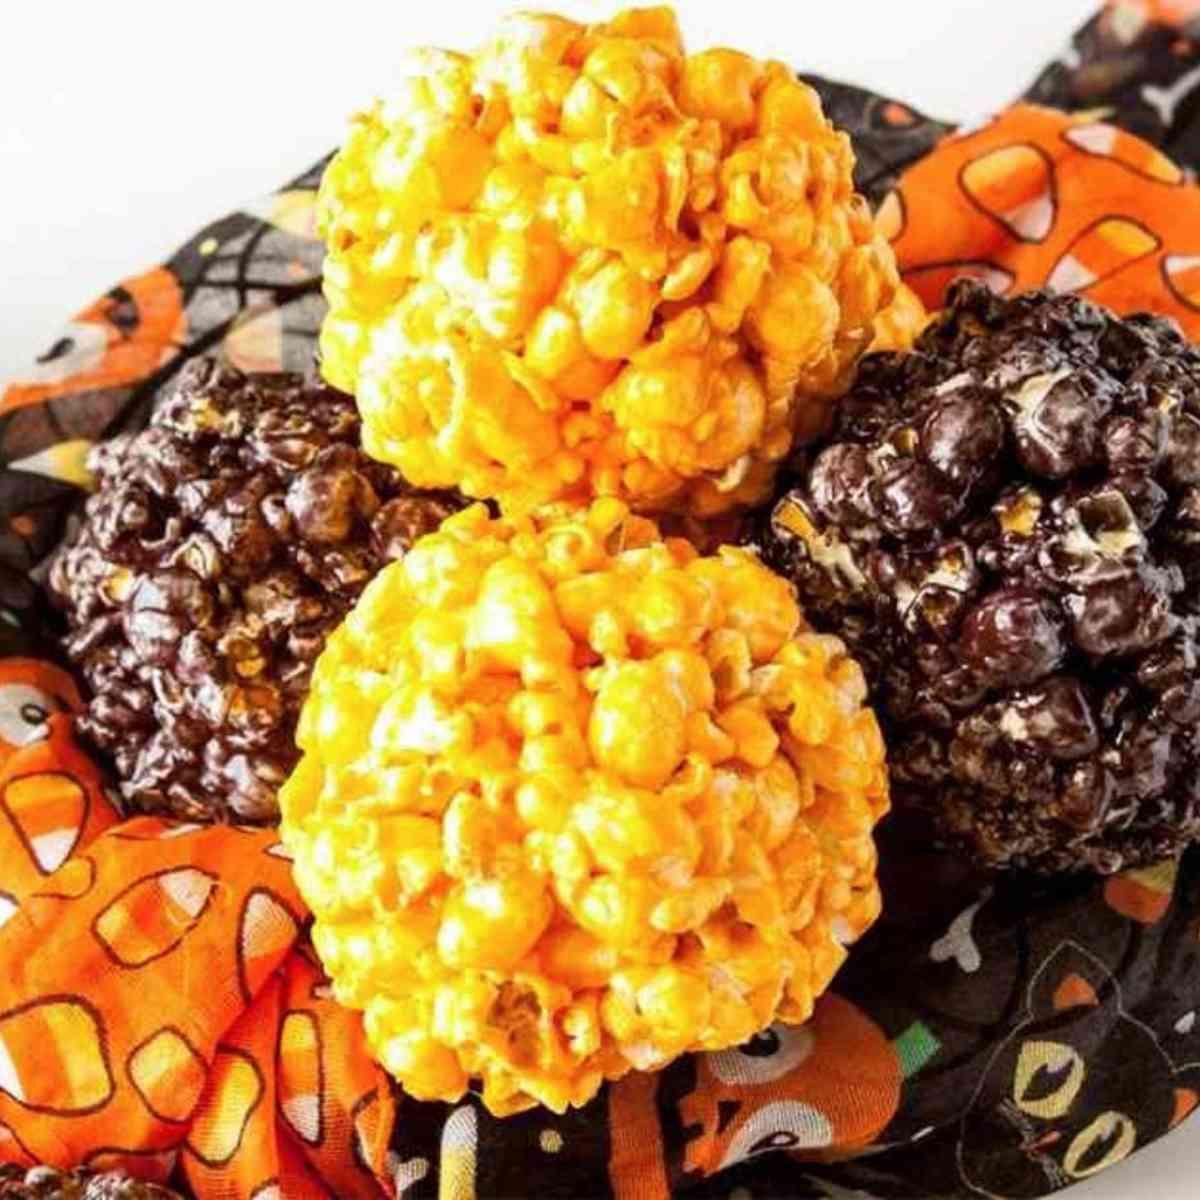 Colorful popcorn marshmallow balls for Halloween